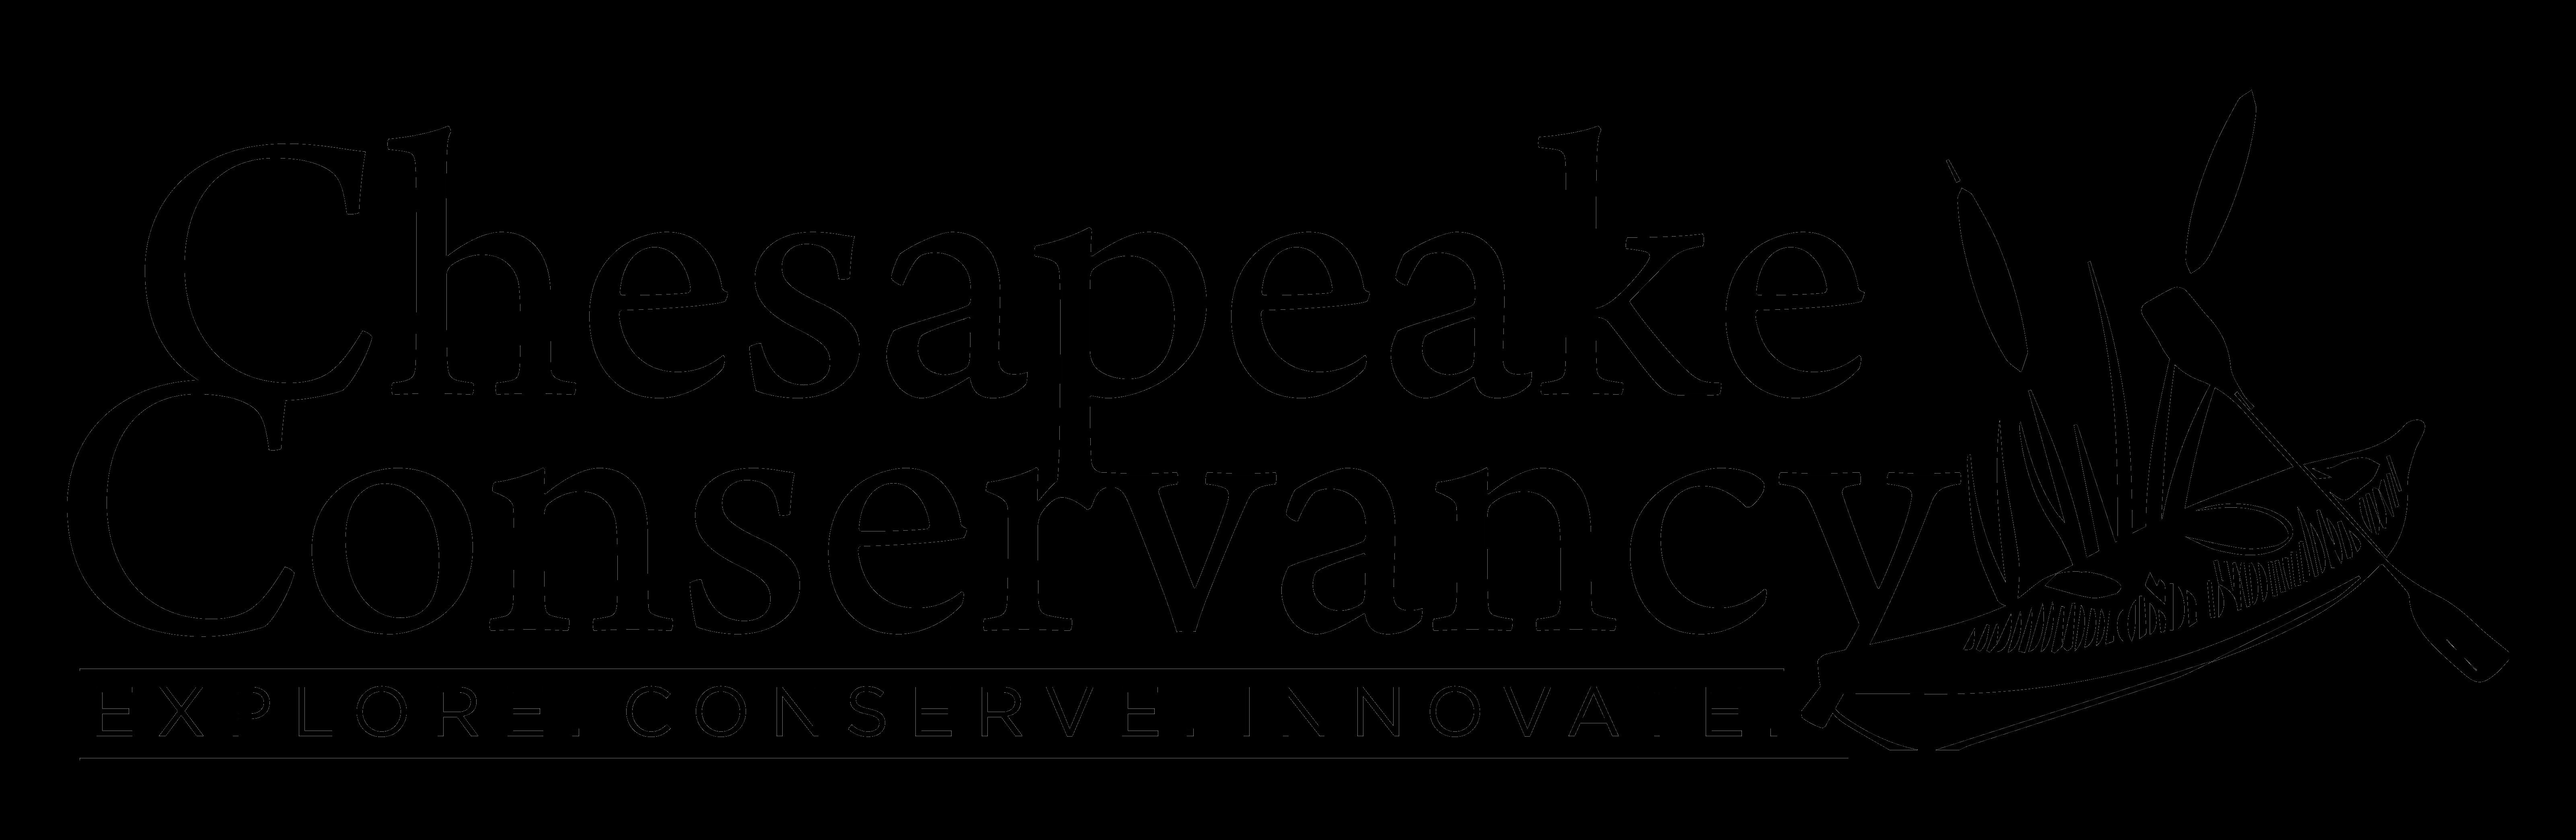 Chesapeake Conservancy Logo